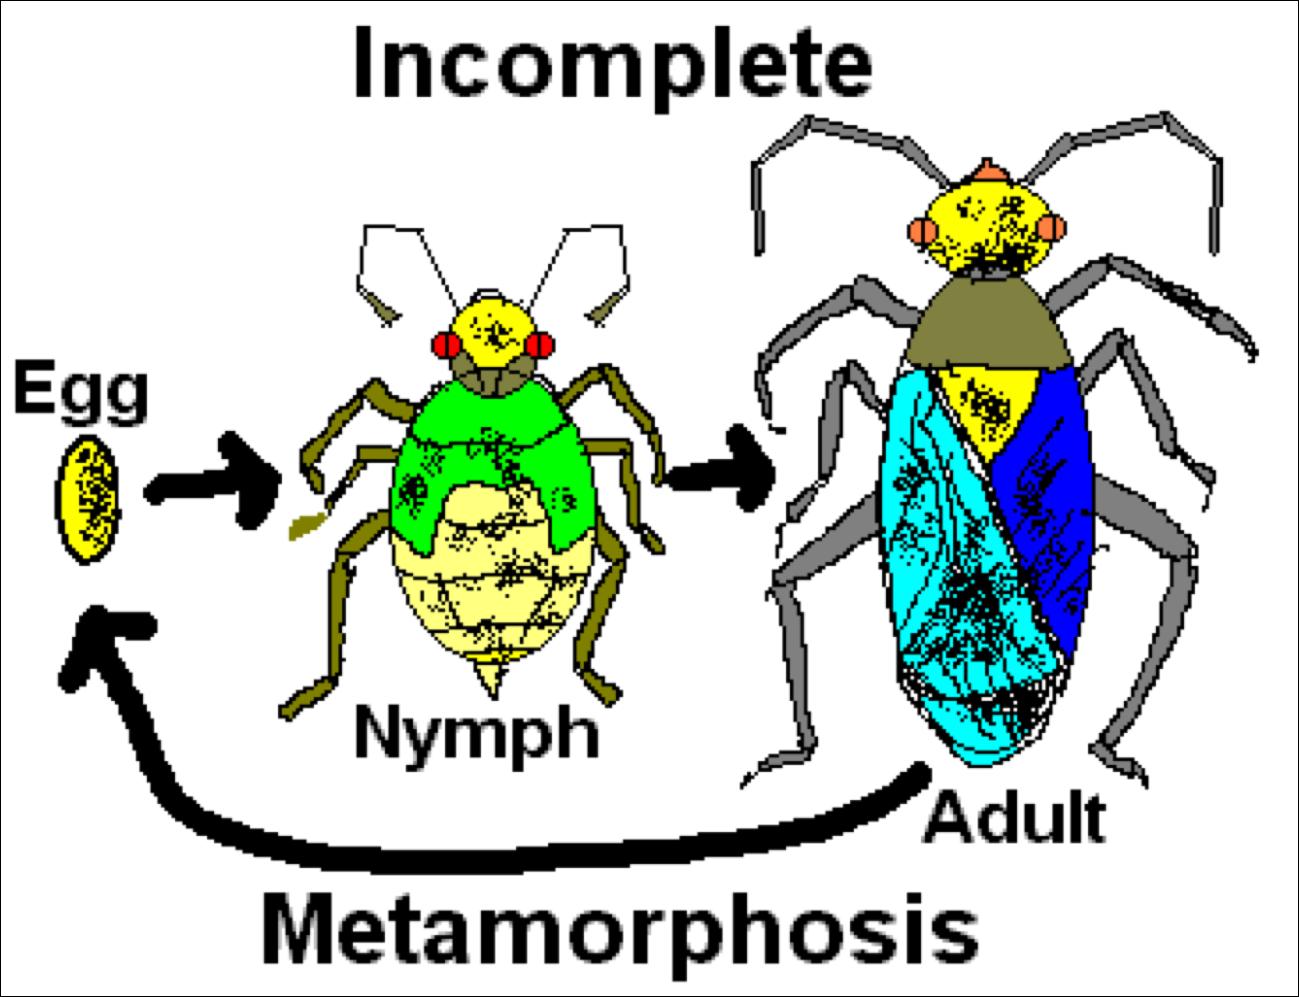 Grasshopper Incomplete Metamorphosis : www.galleryhip.com ...